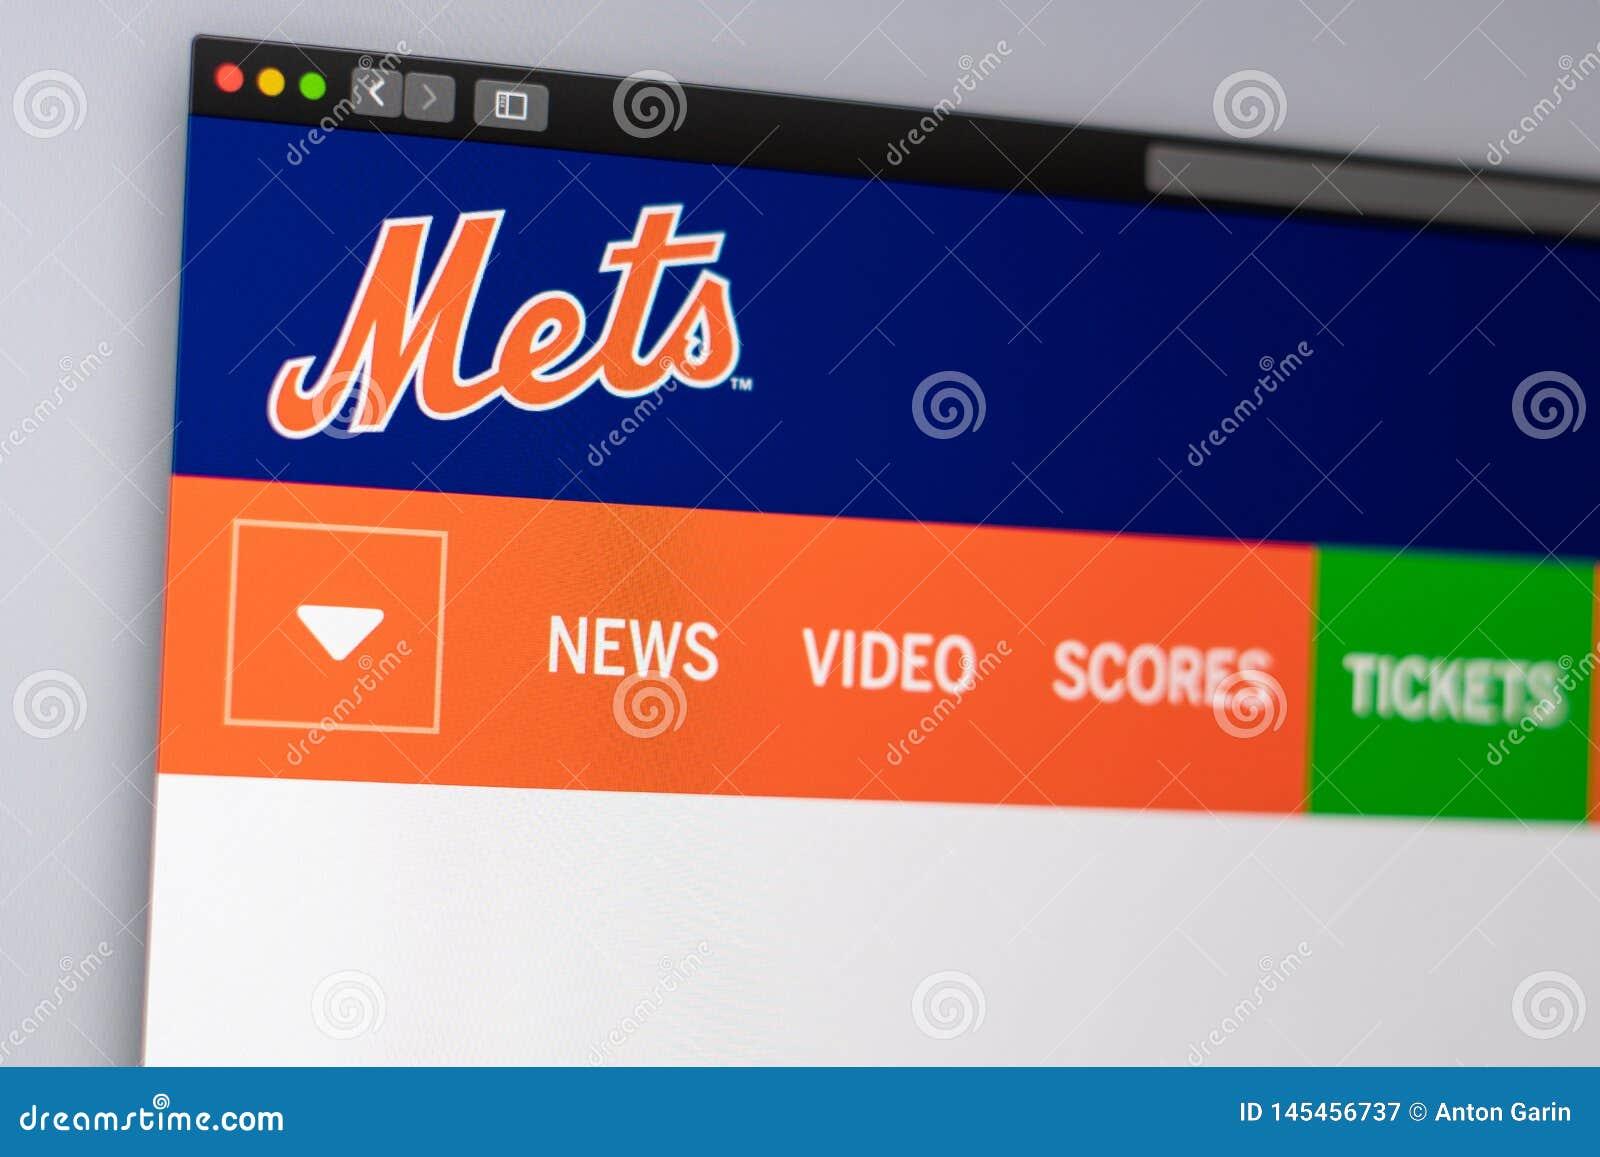 Baseball team New York Mets website homepage. Close up of team logo